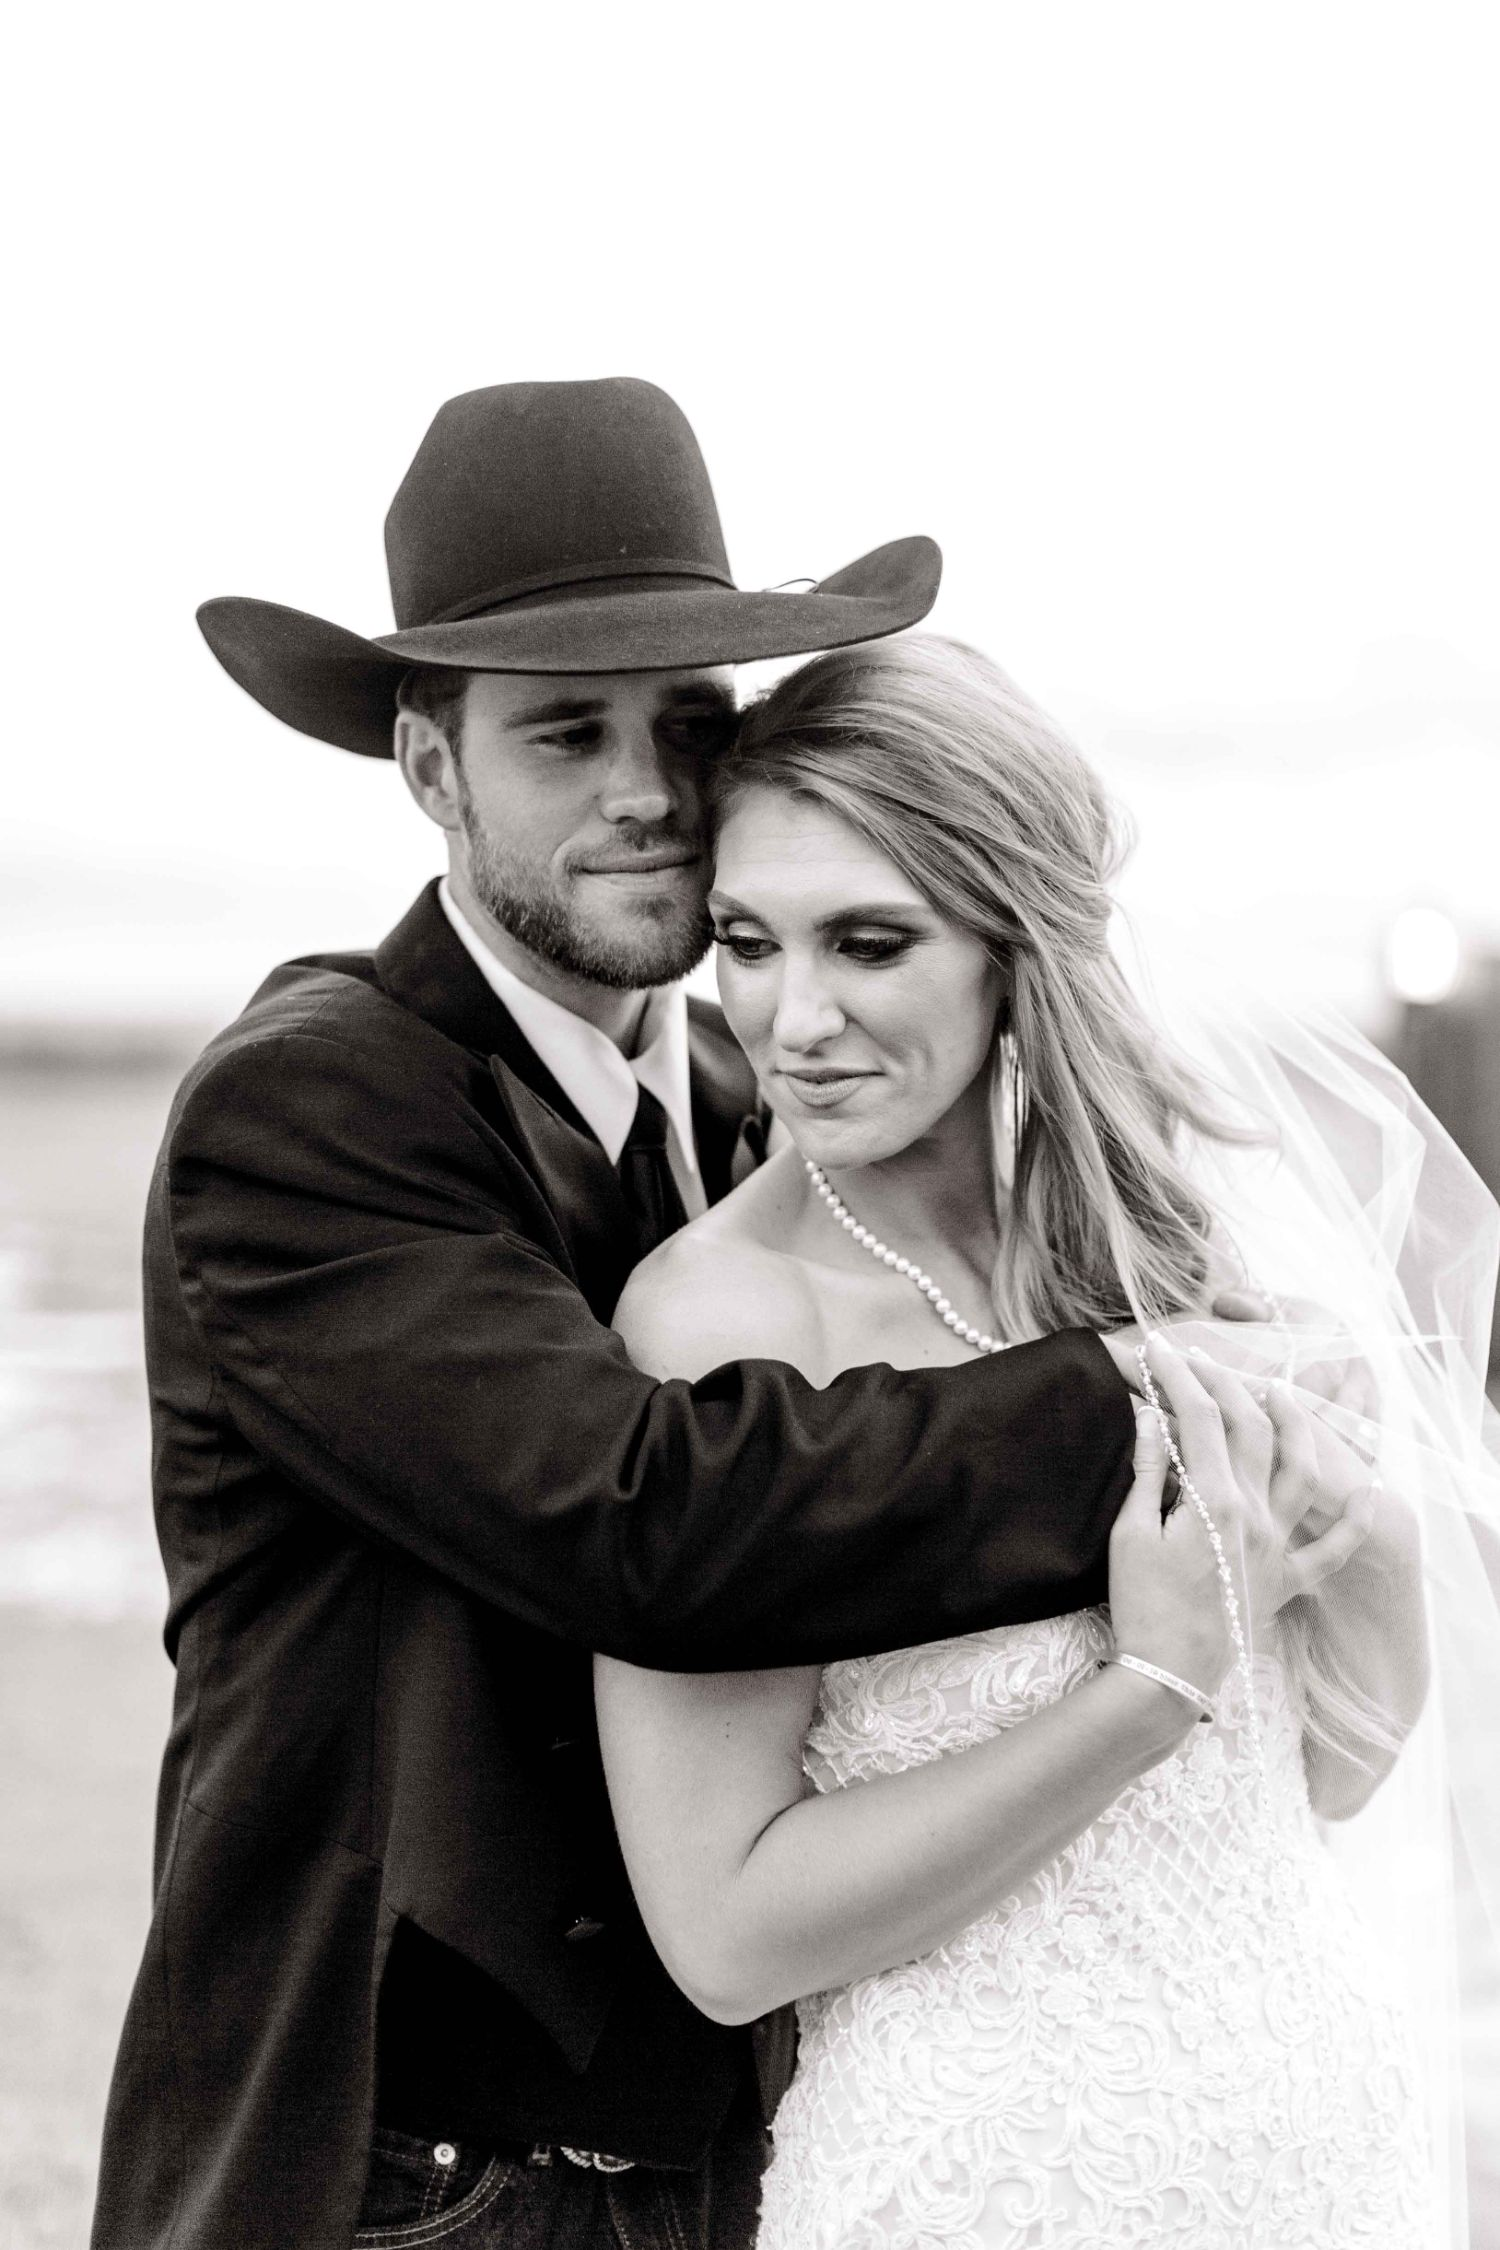 wichita-falls-wedding-katelyn-colten-vernon-texas-38.jpg